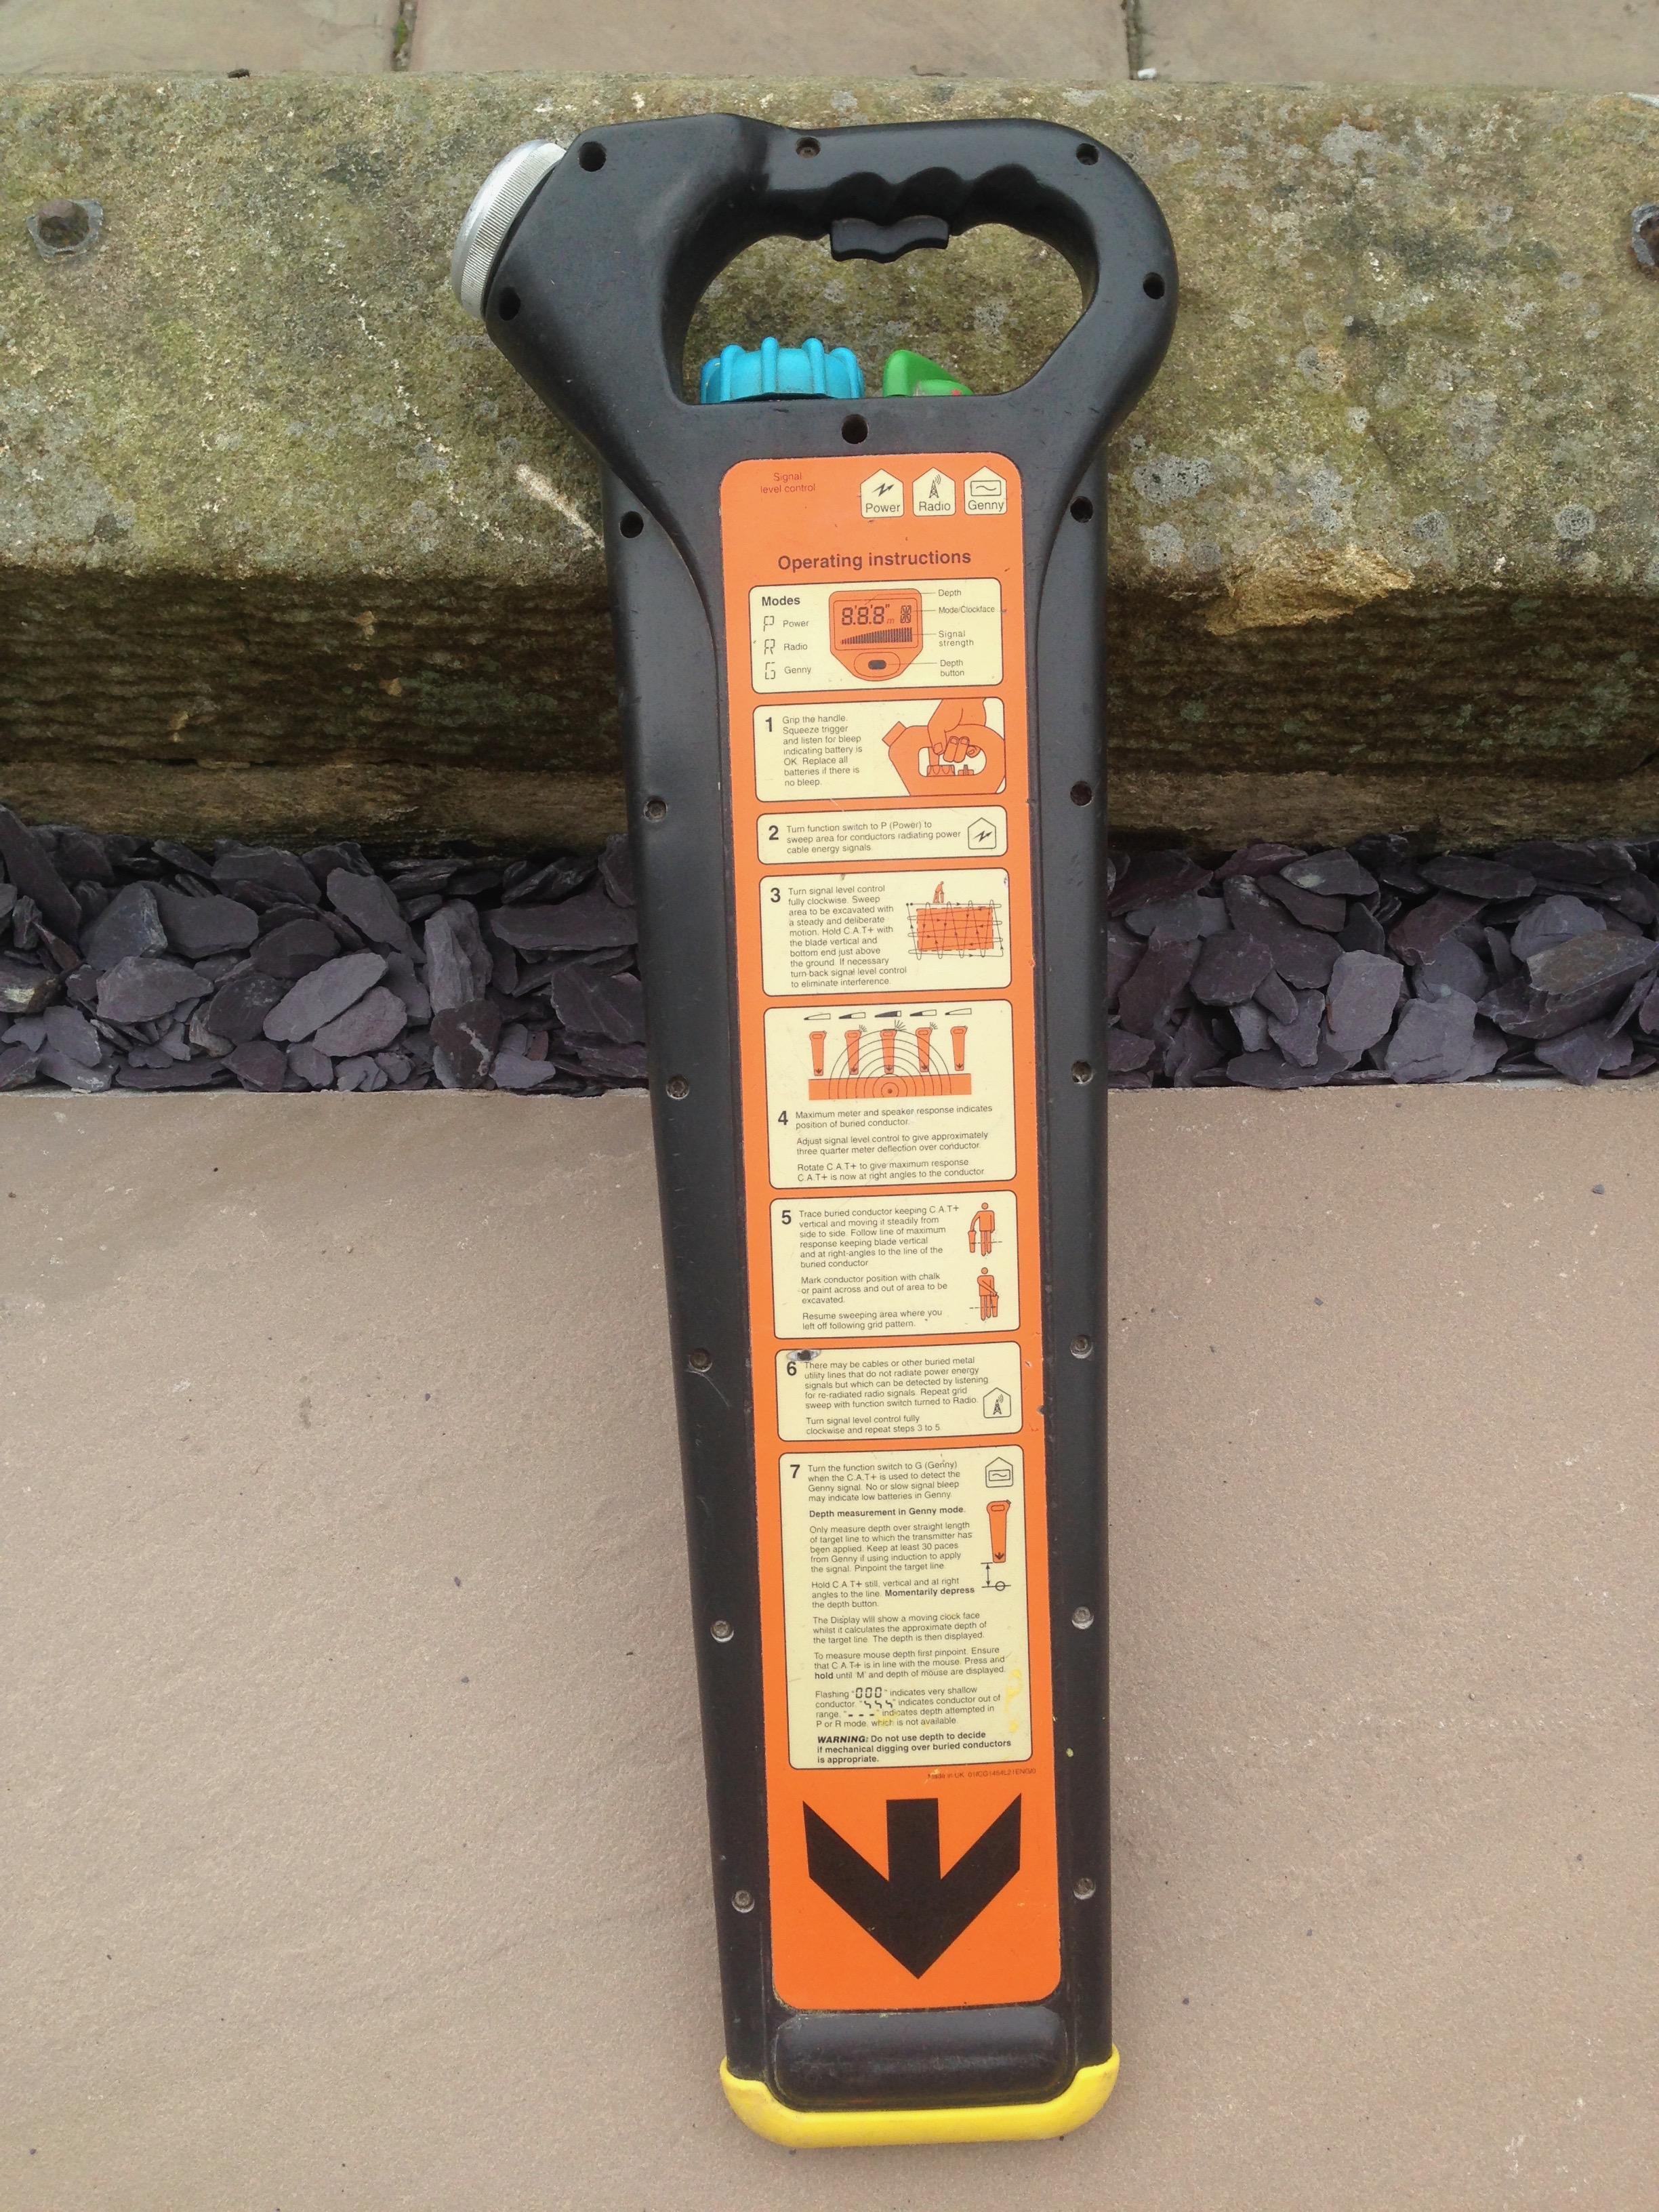 Cat-scanner-site-safety-blackoak-surfacing